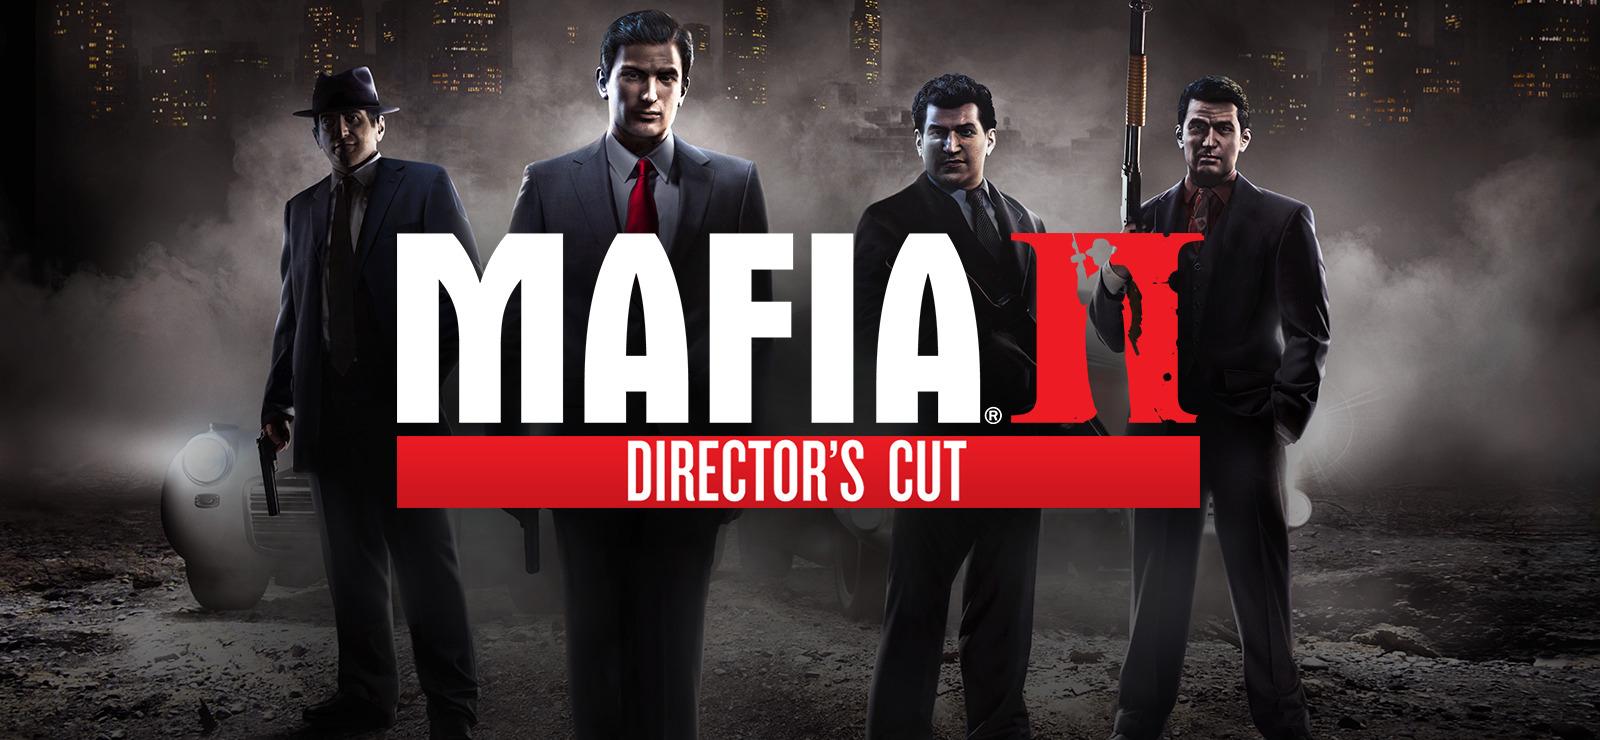 GOG [PC]: Mafia II: Director's Cut (incluye TODO el DLC) - MÍNIMO HISTÓRICO